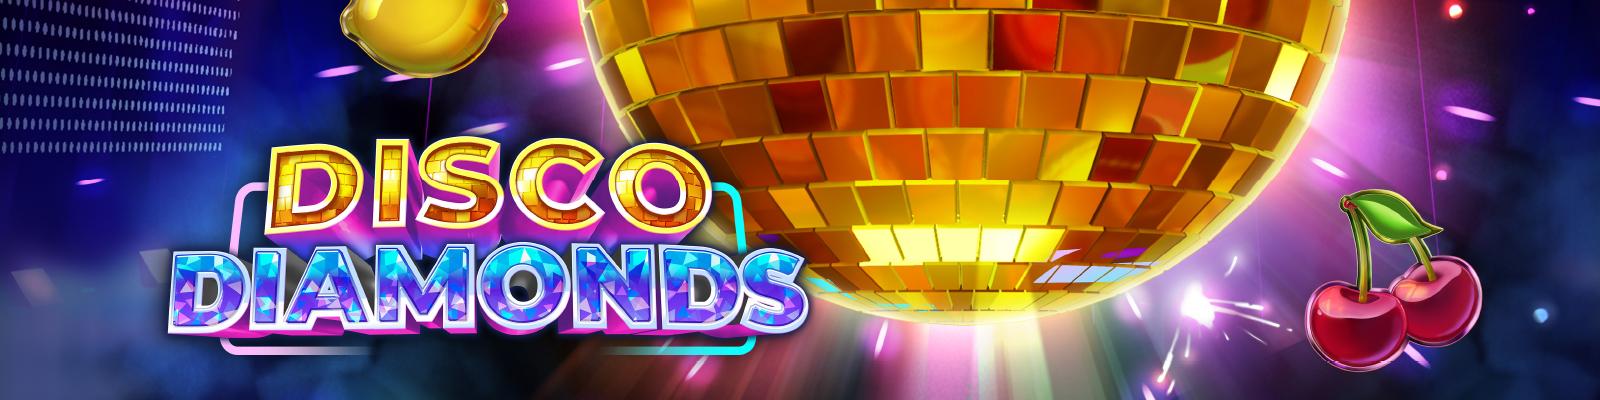 Disco Diamonds Play'n Go slot free spins bonus Chanz